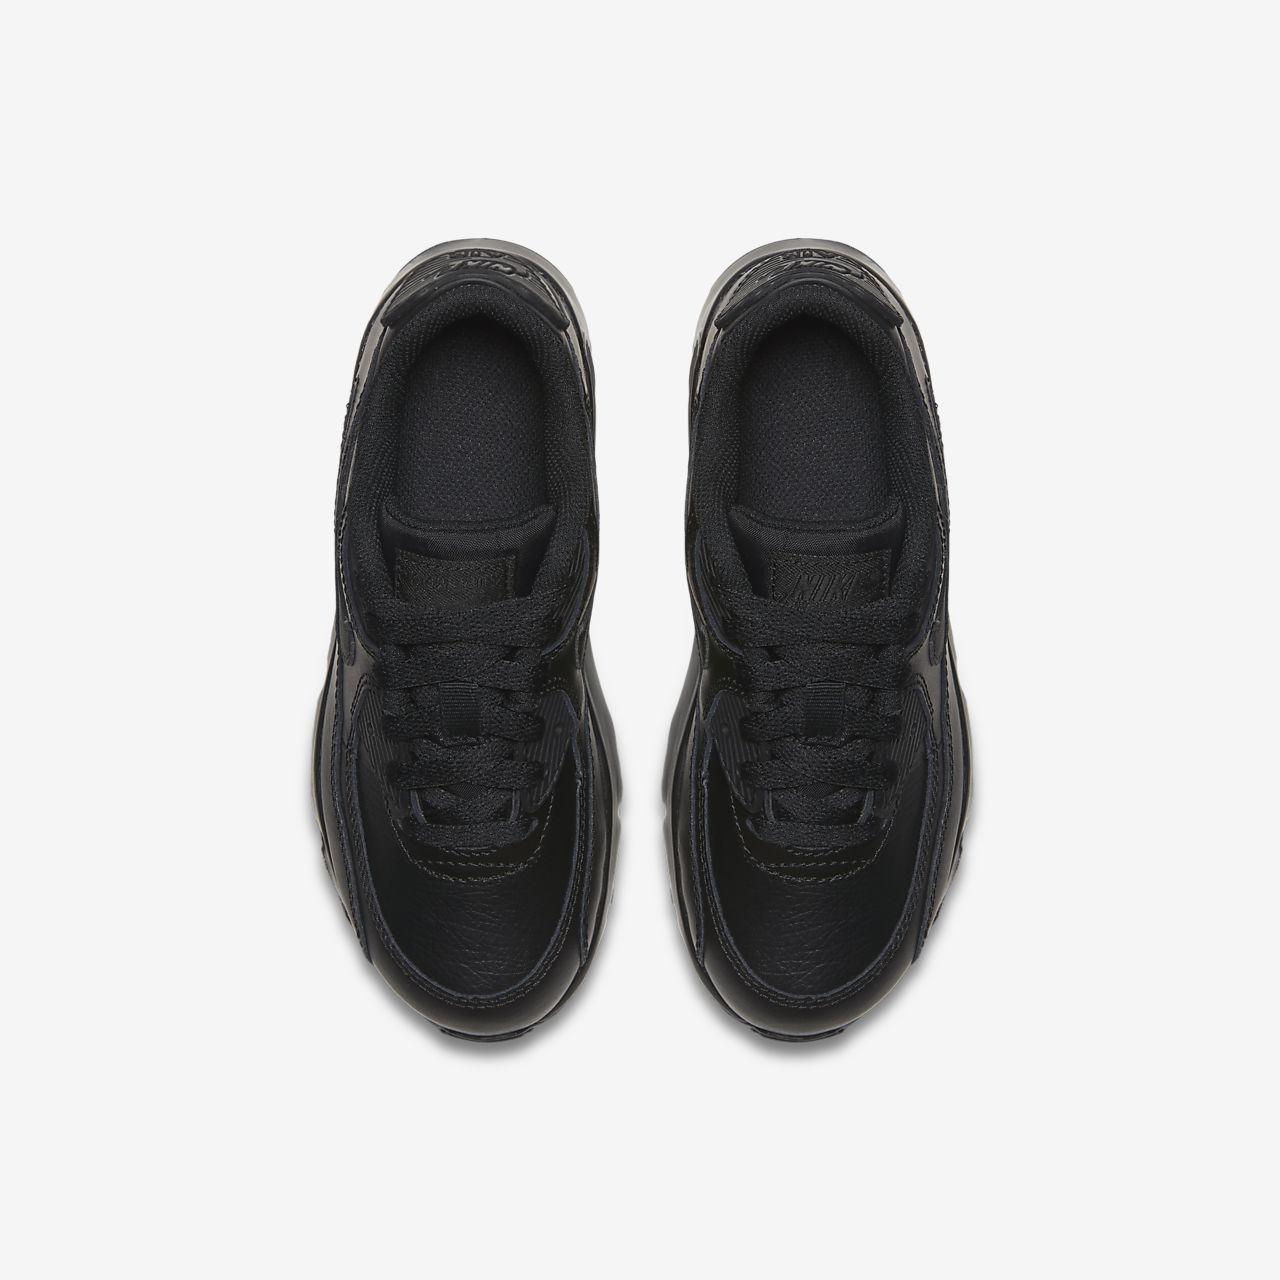 Air Max 90 Leather sko for små barn